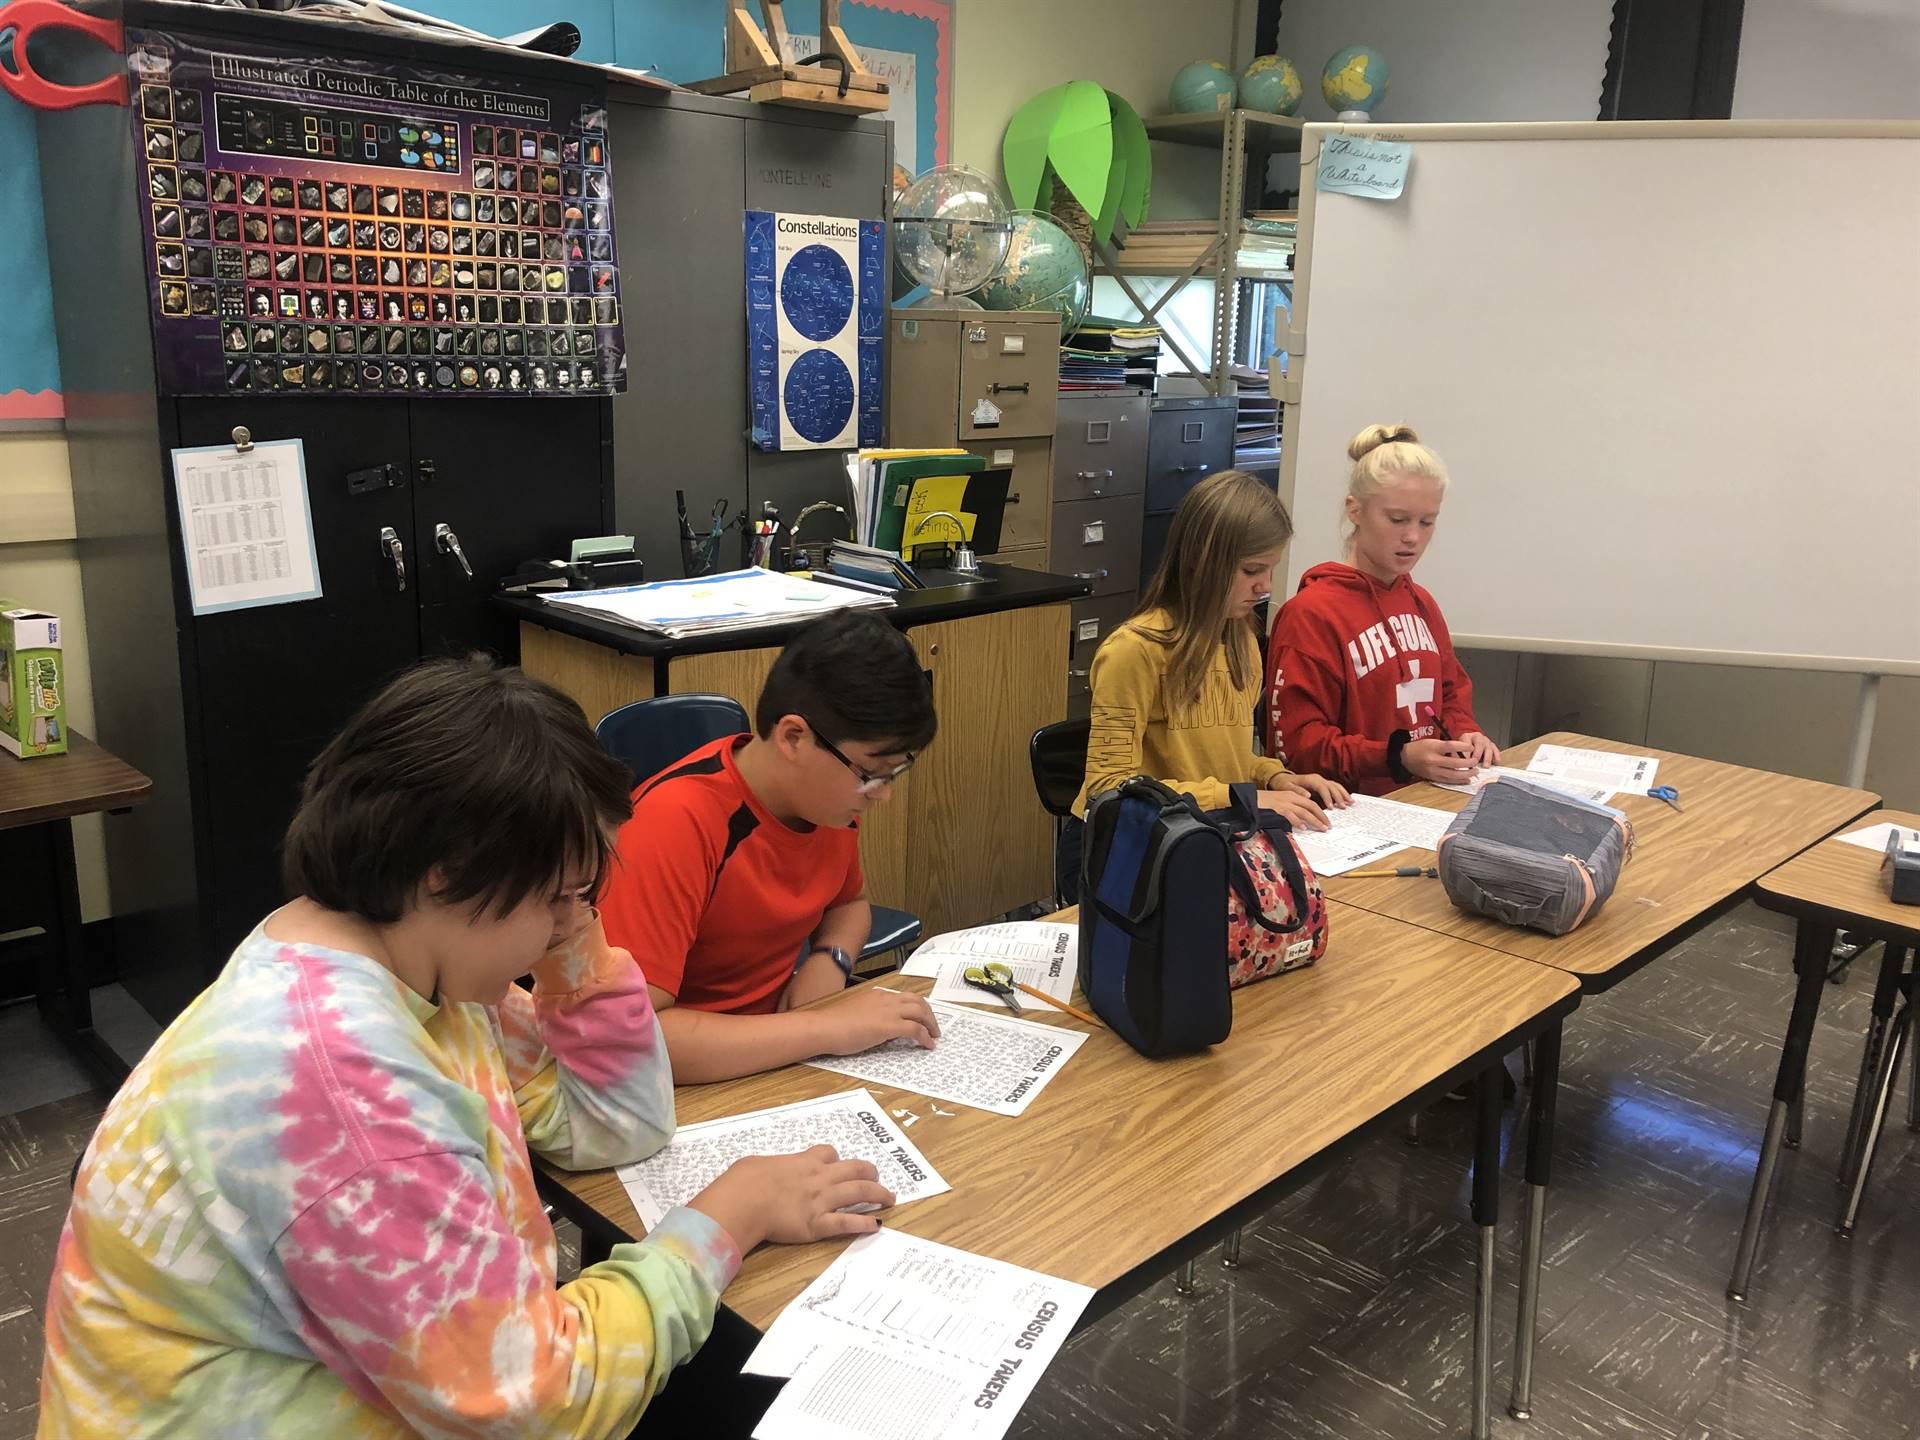 4 students applying strategies in animal sampling activity